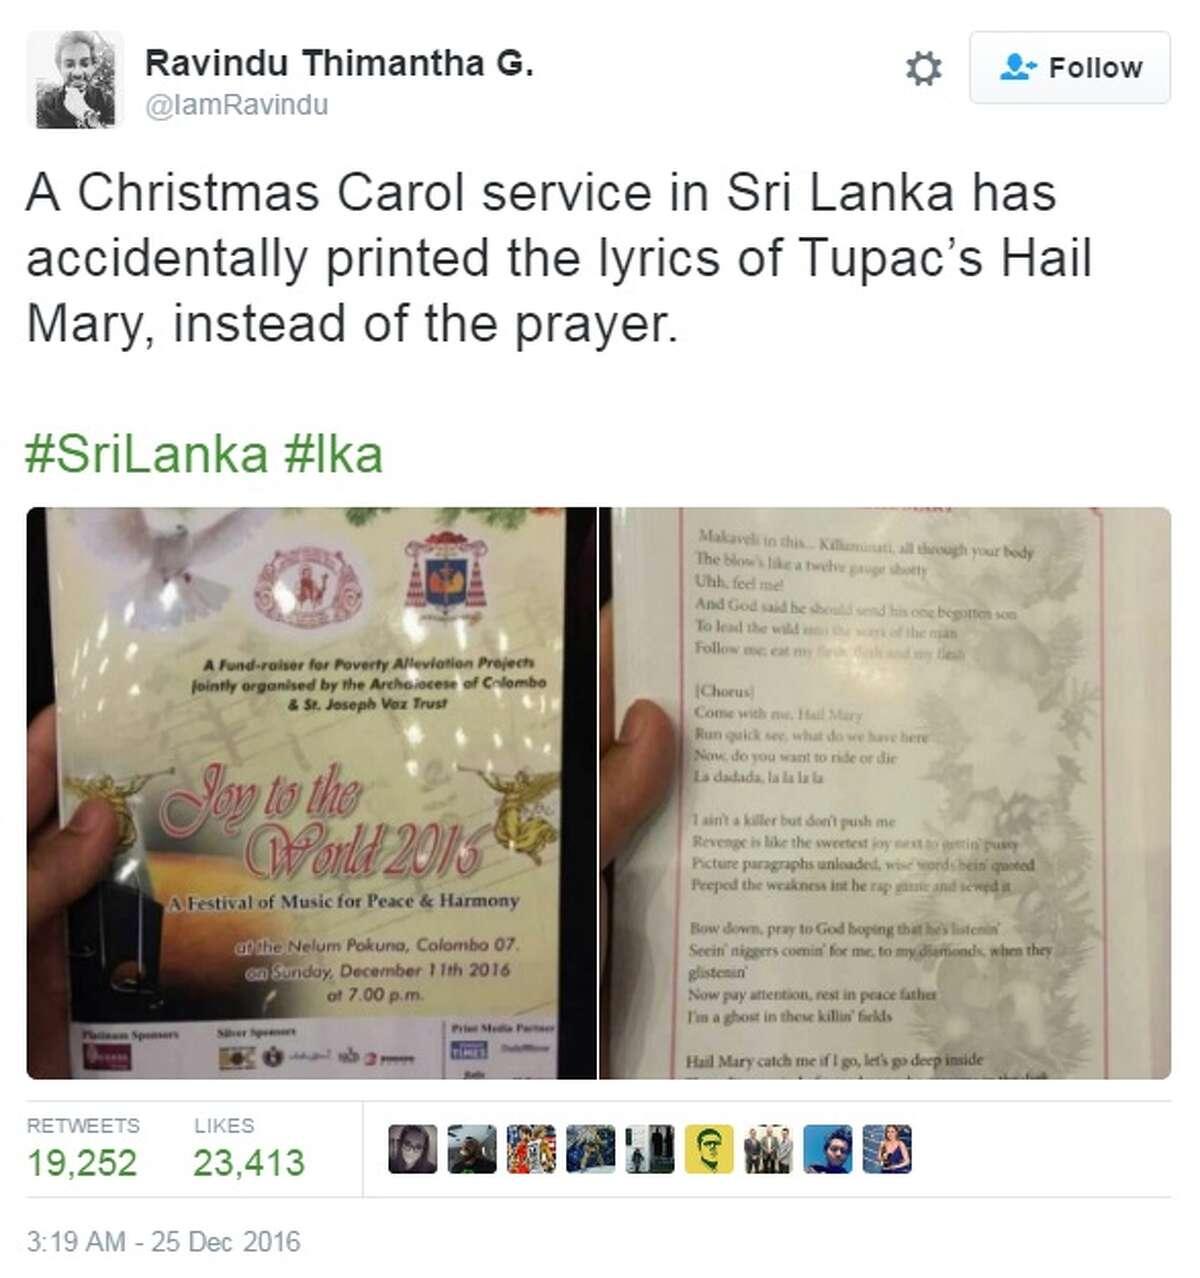 A church in Sri Lanka printed Tupac's